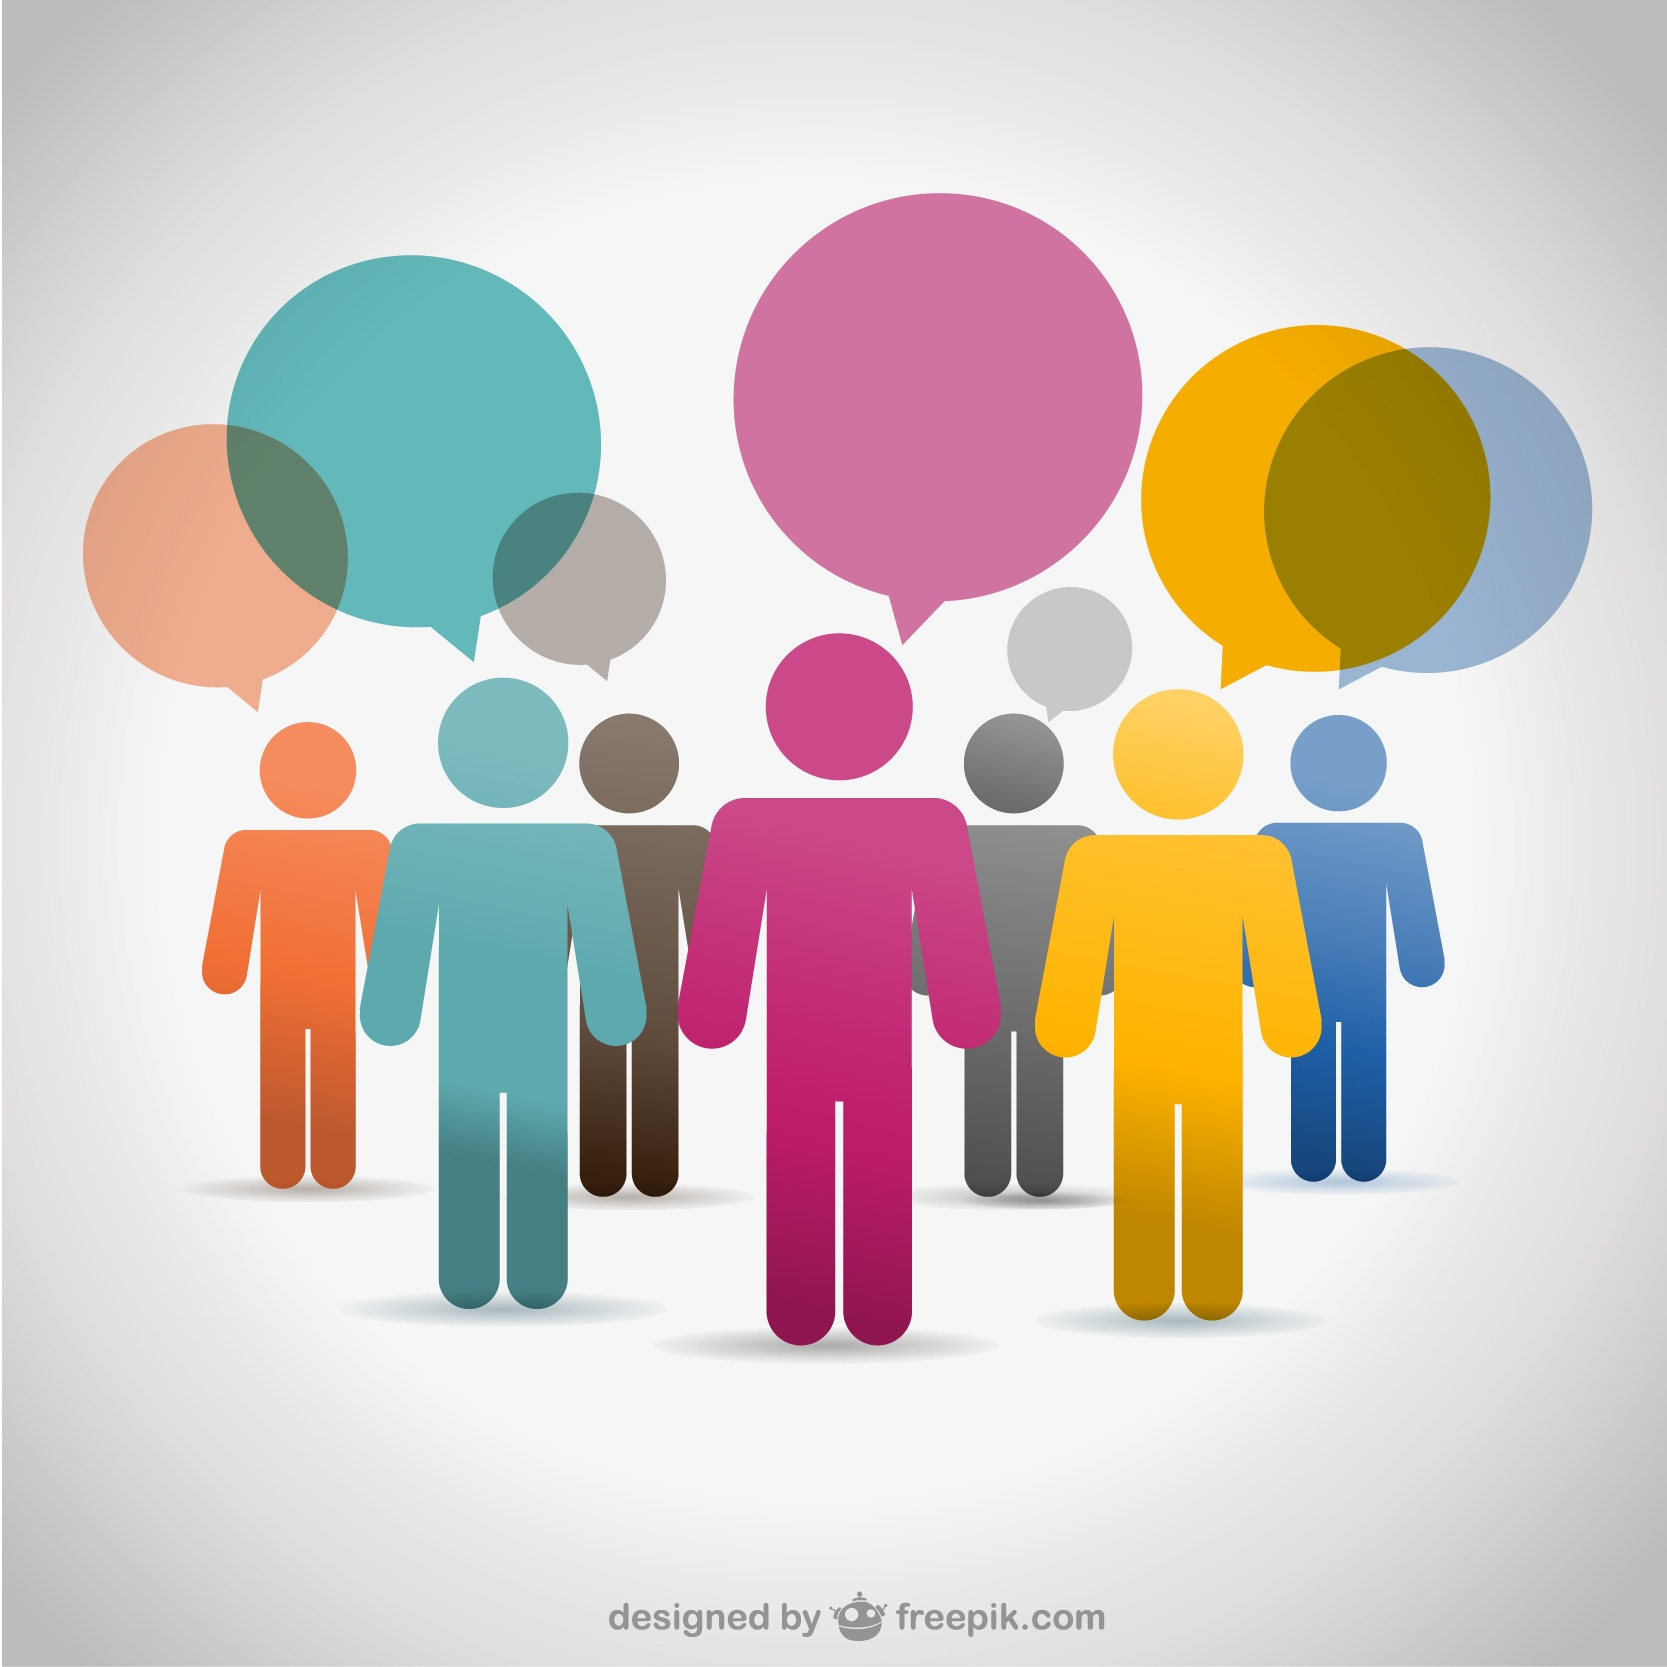 A culture encouraging honest conversations